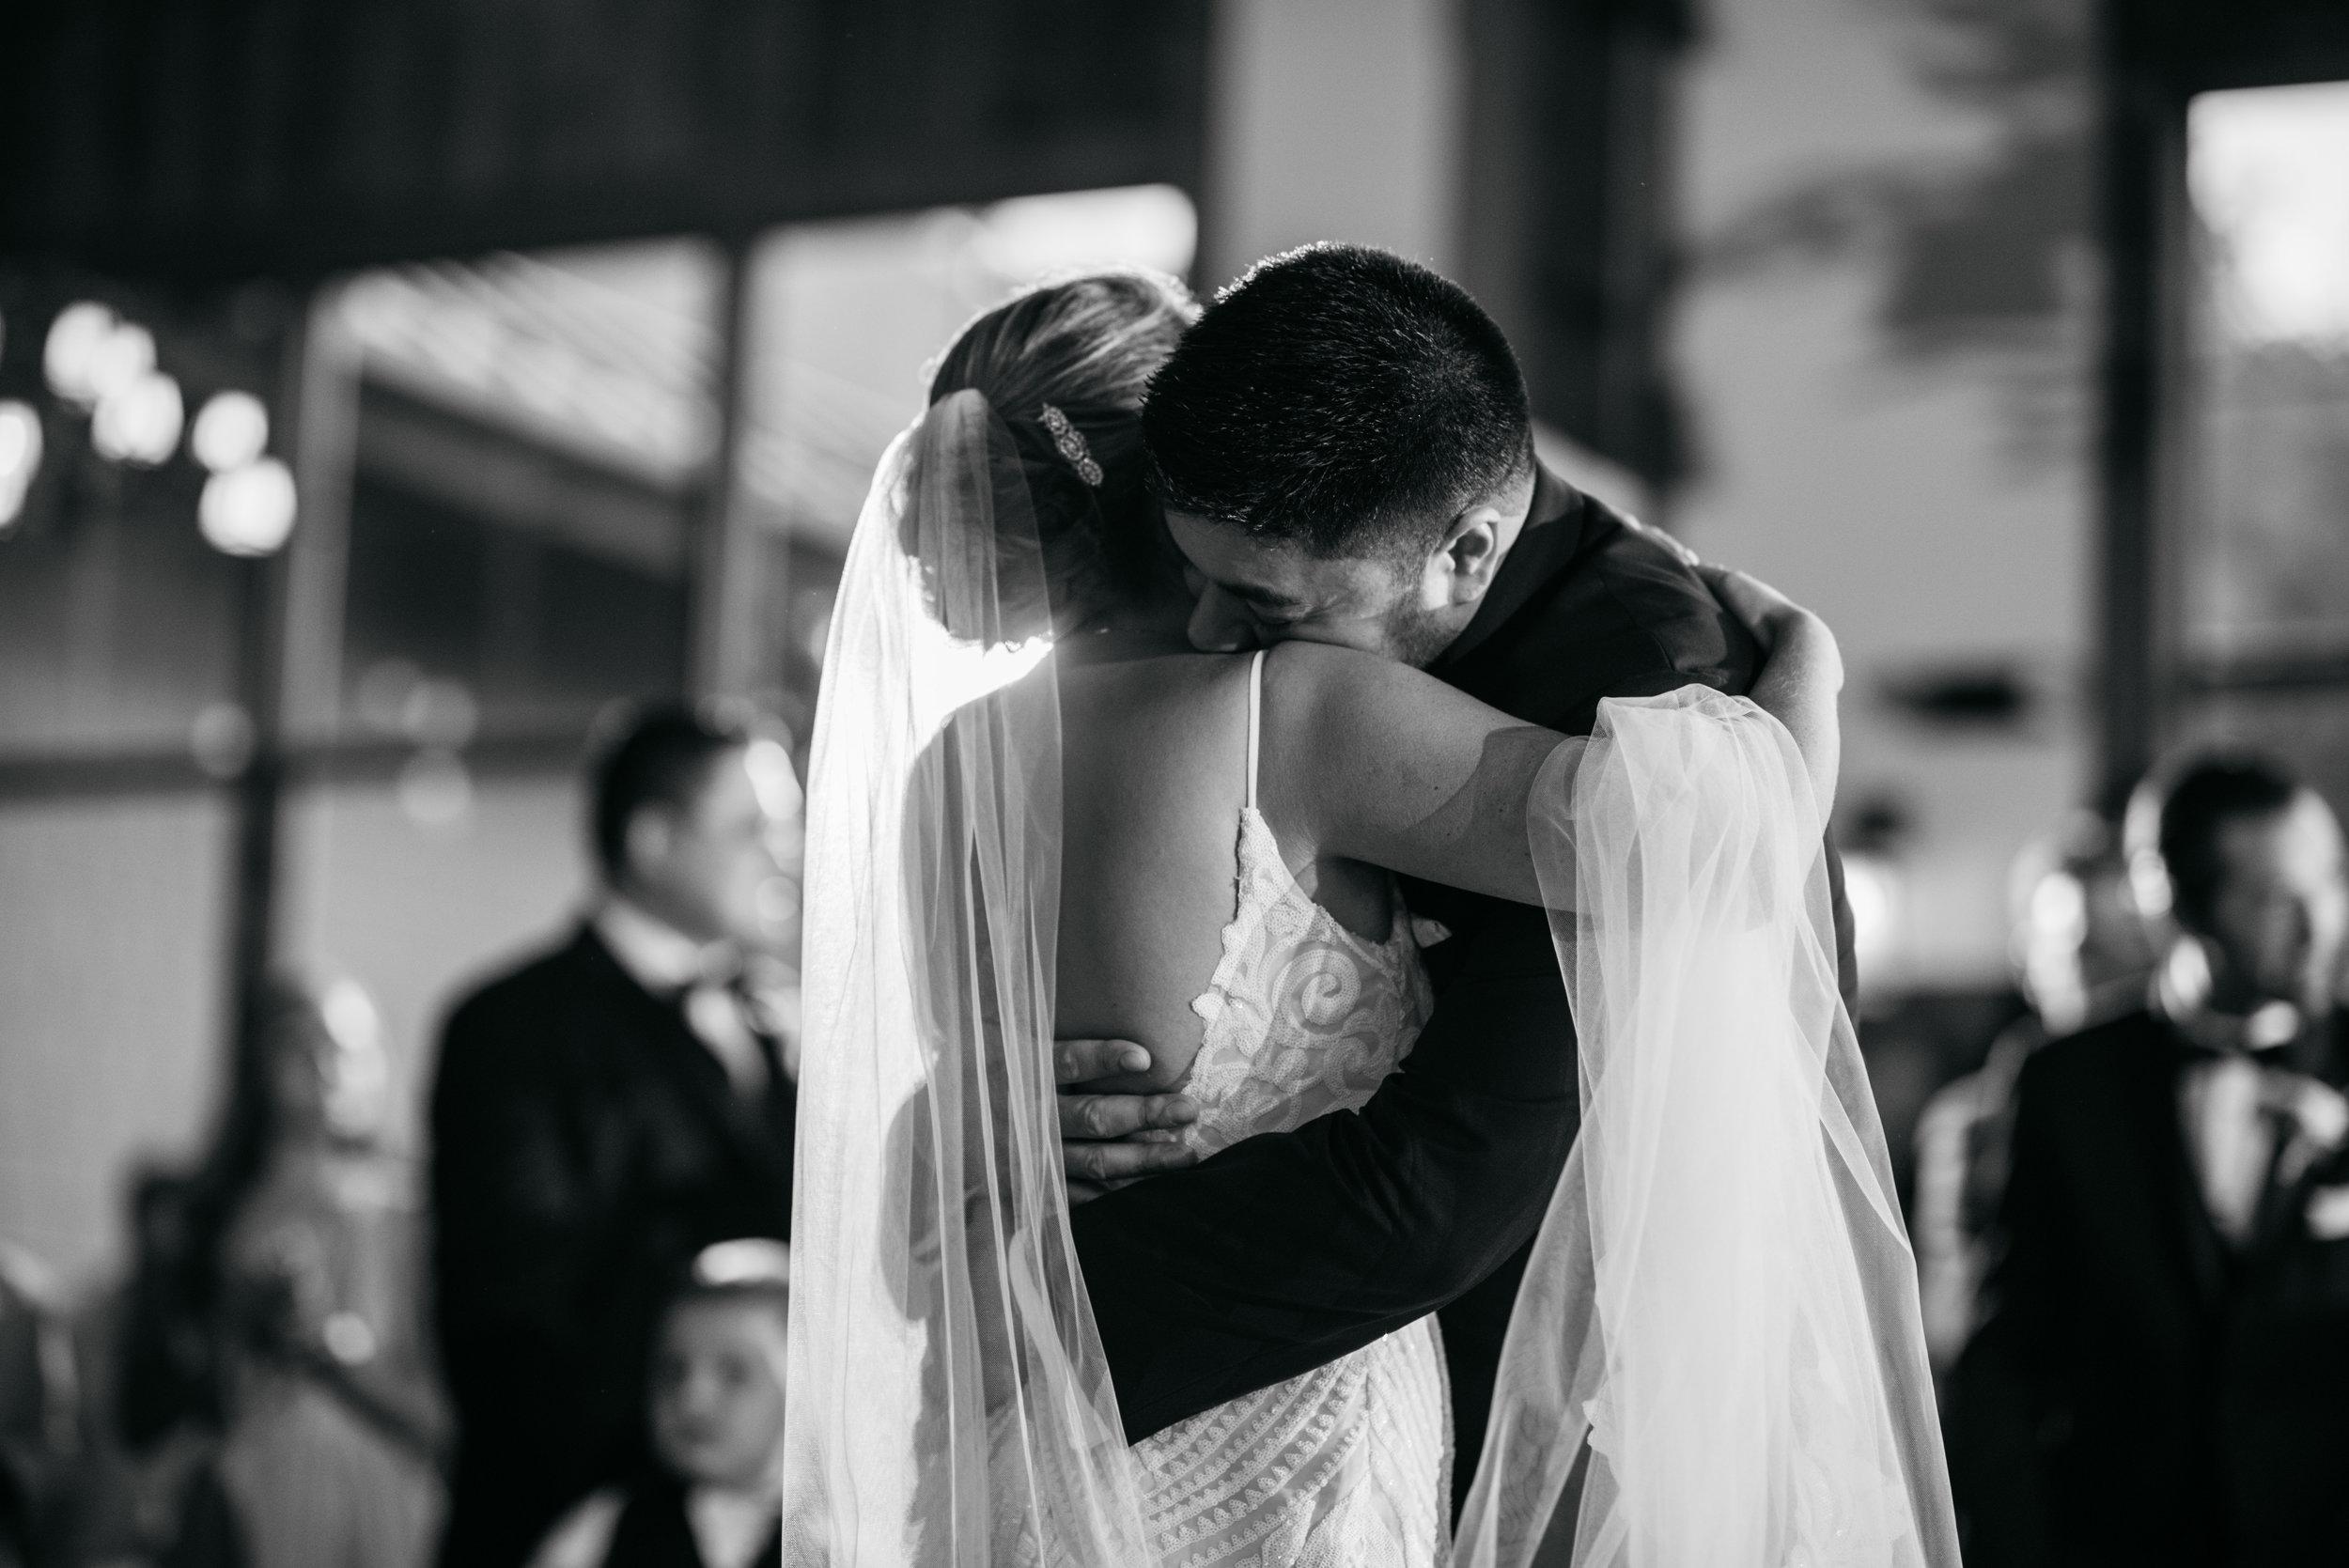 WeddingPhotos | NJPhotographer | Highlights-12-7.jpg